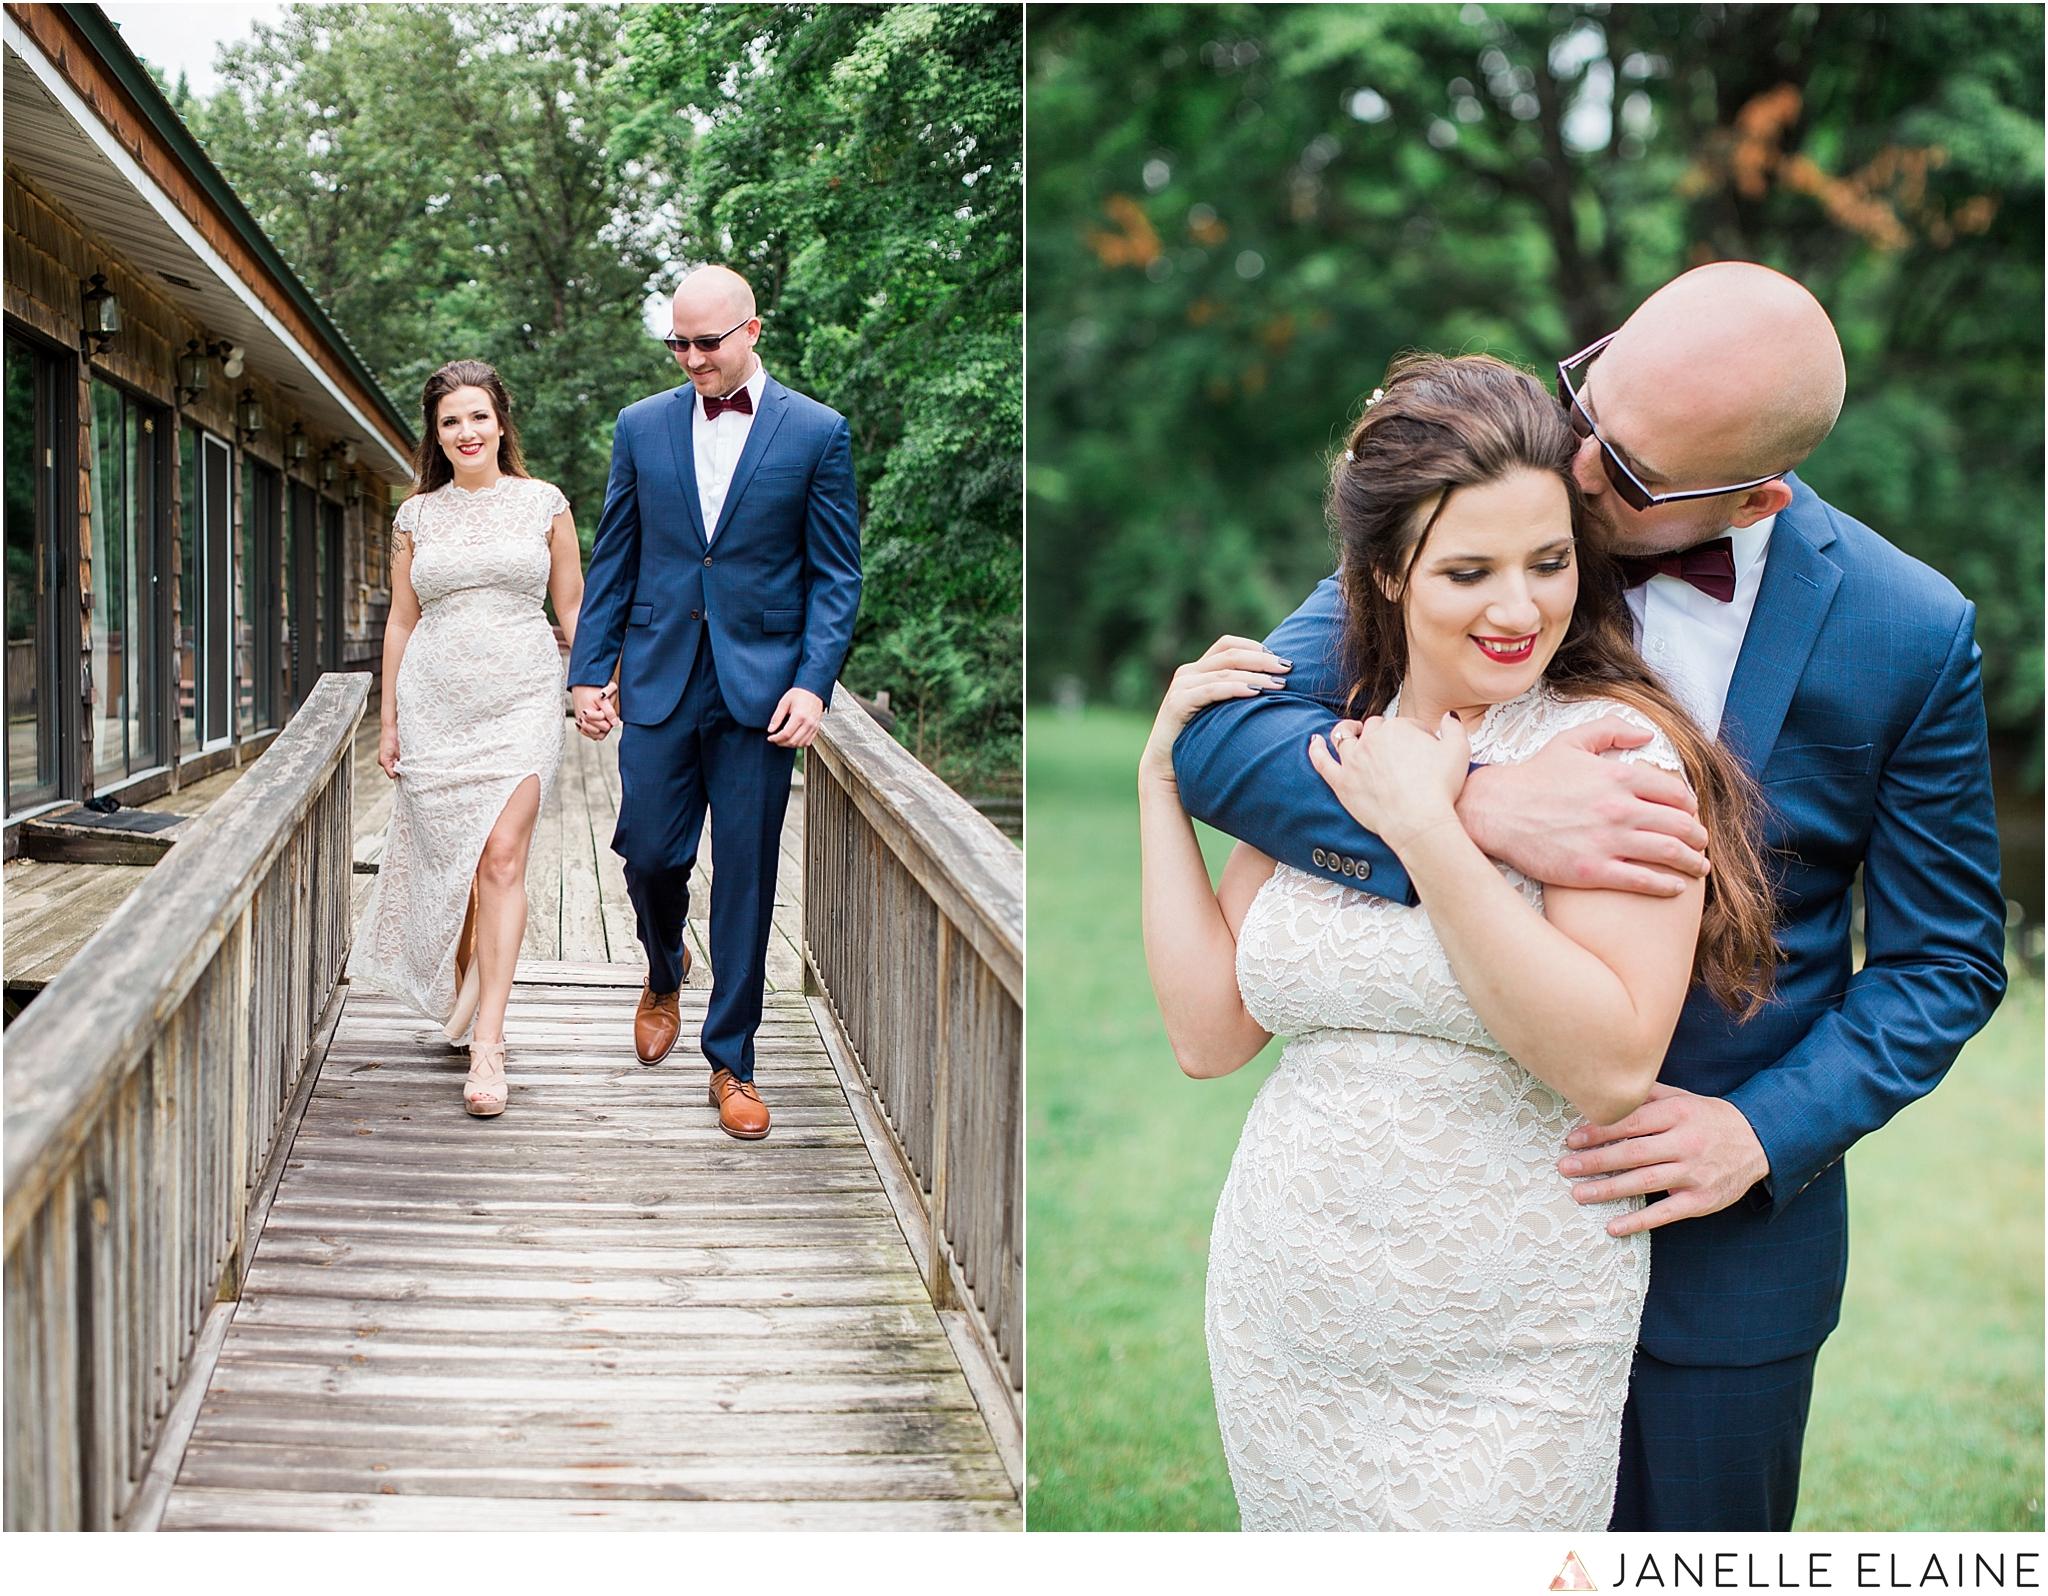 janelle elaine photography-seattle-destination-wedding-photographer-29.jpg